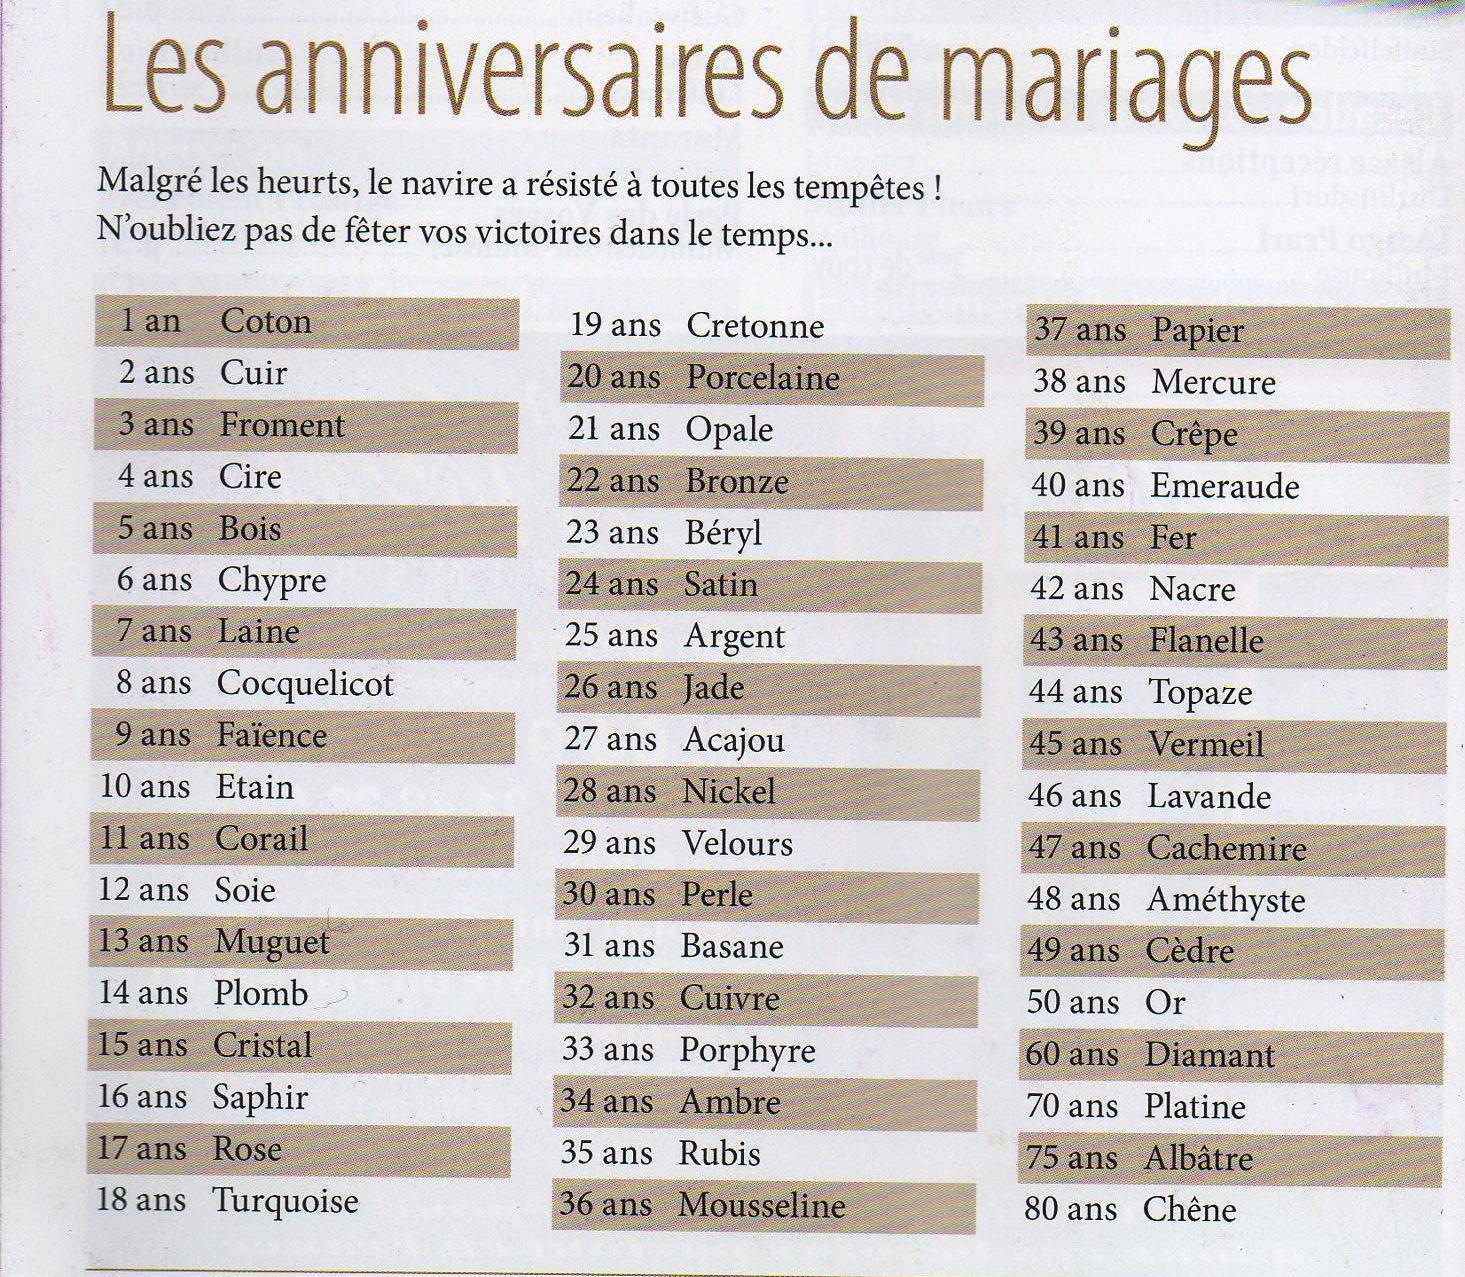 Tindomerel mai 2012 - 4 ans de mariage noce de quoi ...